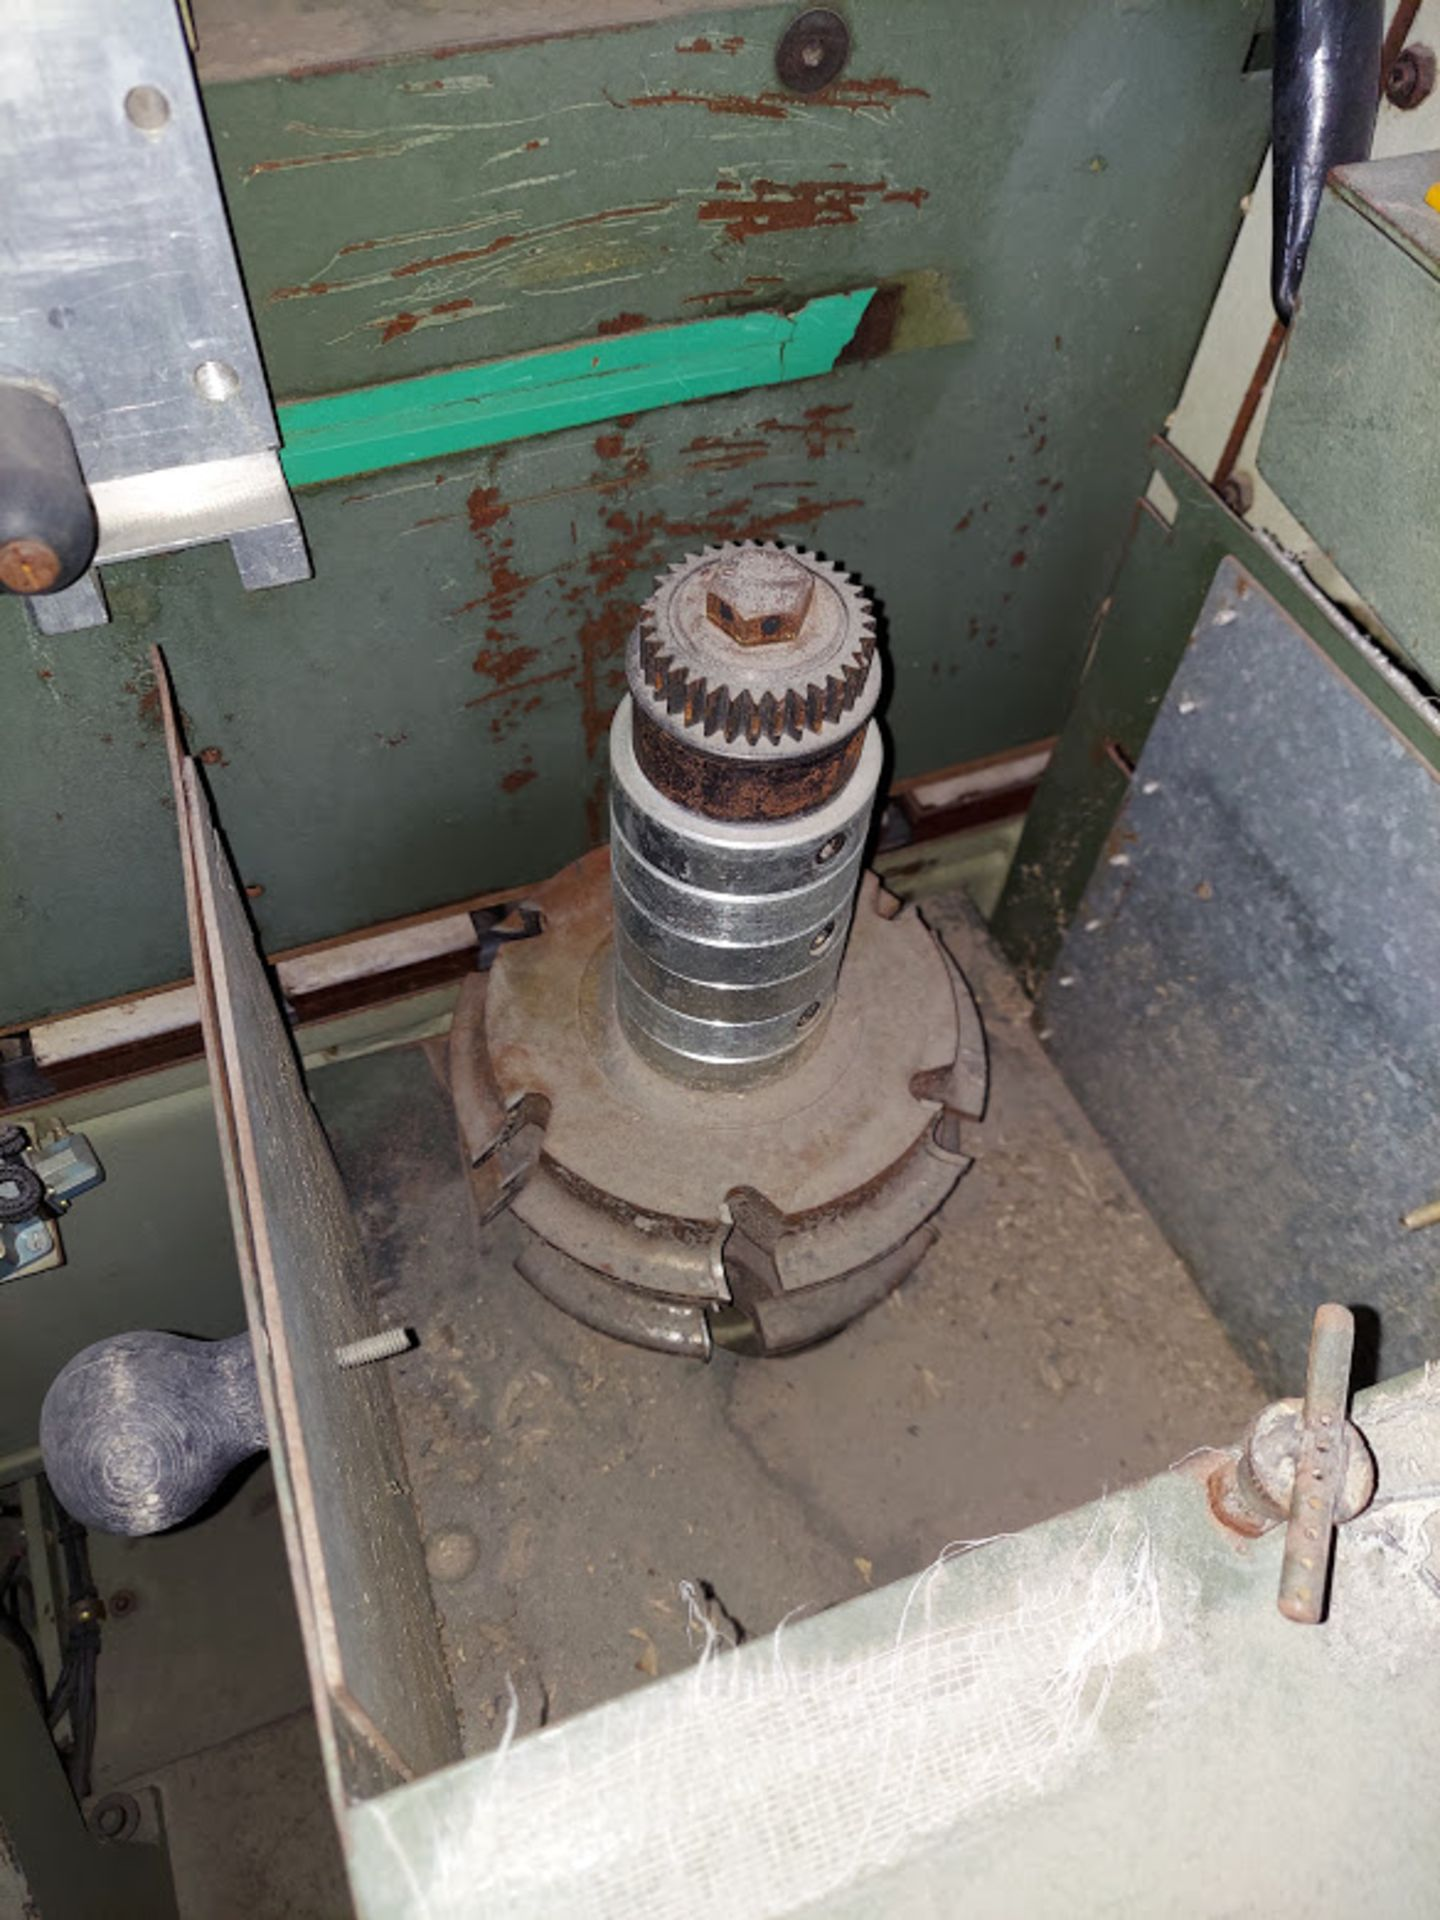 SCMI Center Machine, Model #Center, 1 - Shaper Head 230 Volt 3 Phase, Sanding Station, Power Feed - Image 4 of 7